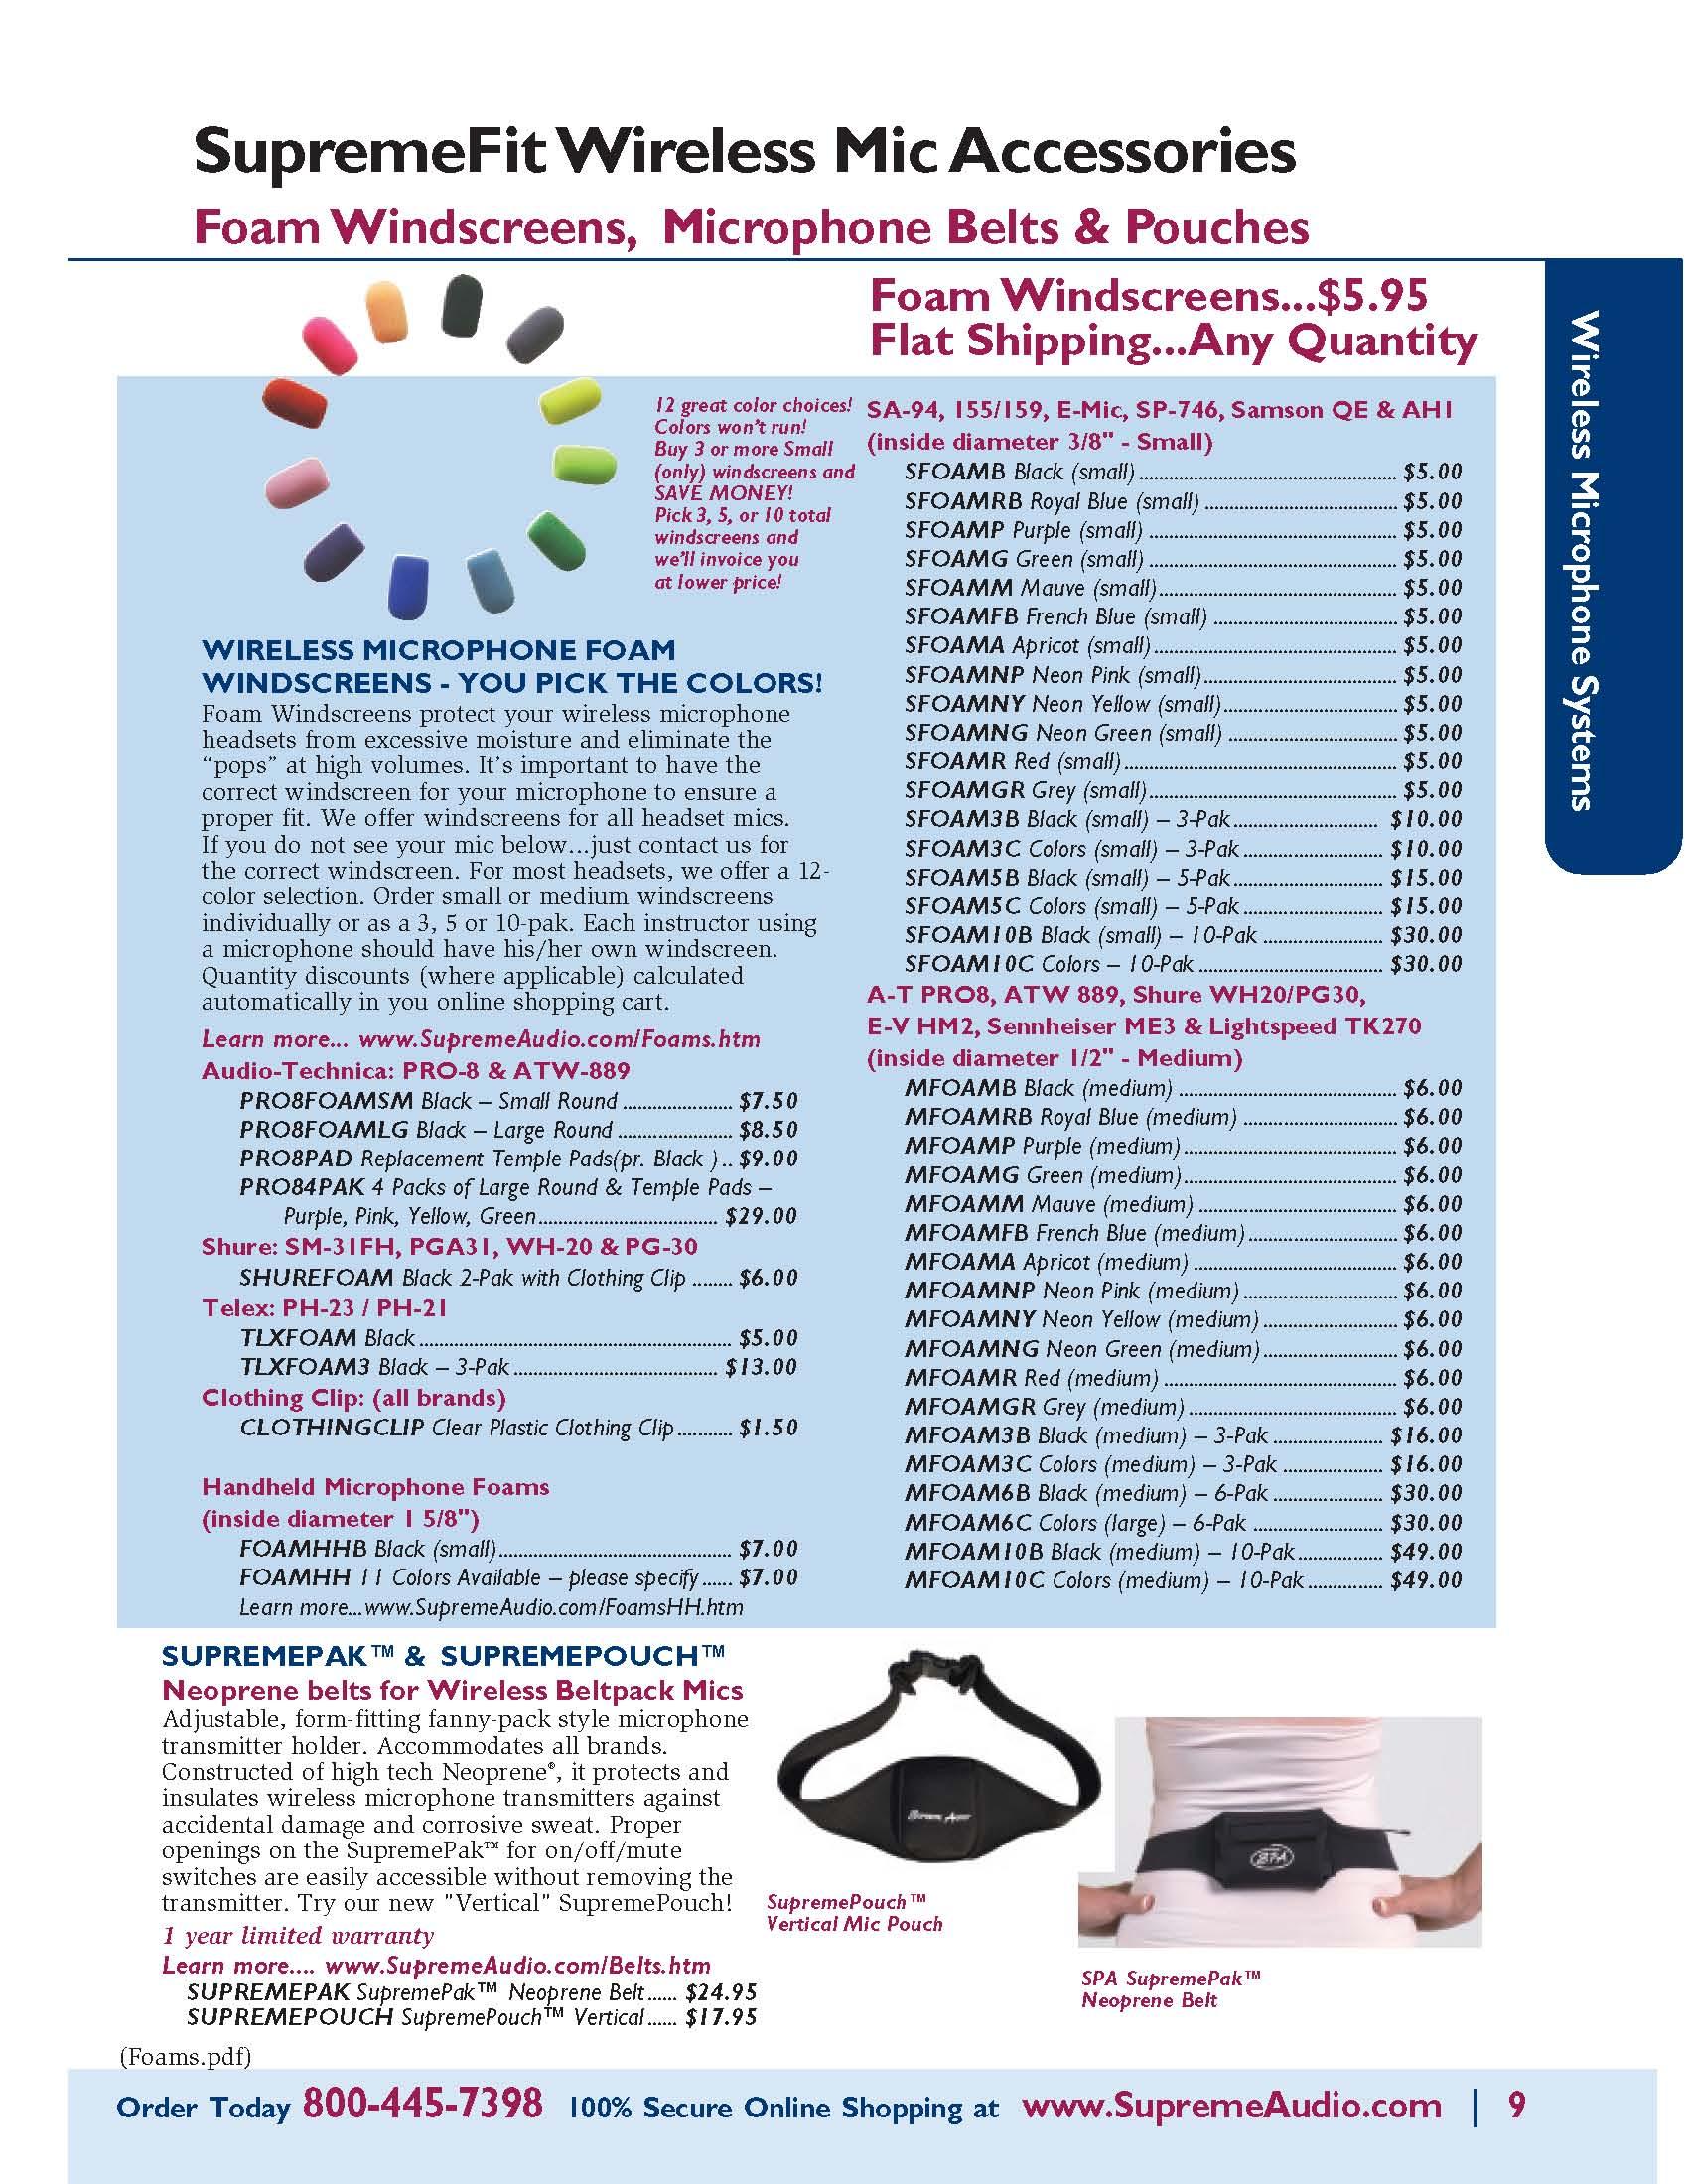 Microphone Foam Windscreen Catalog Page